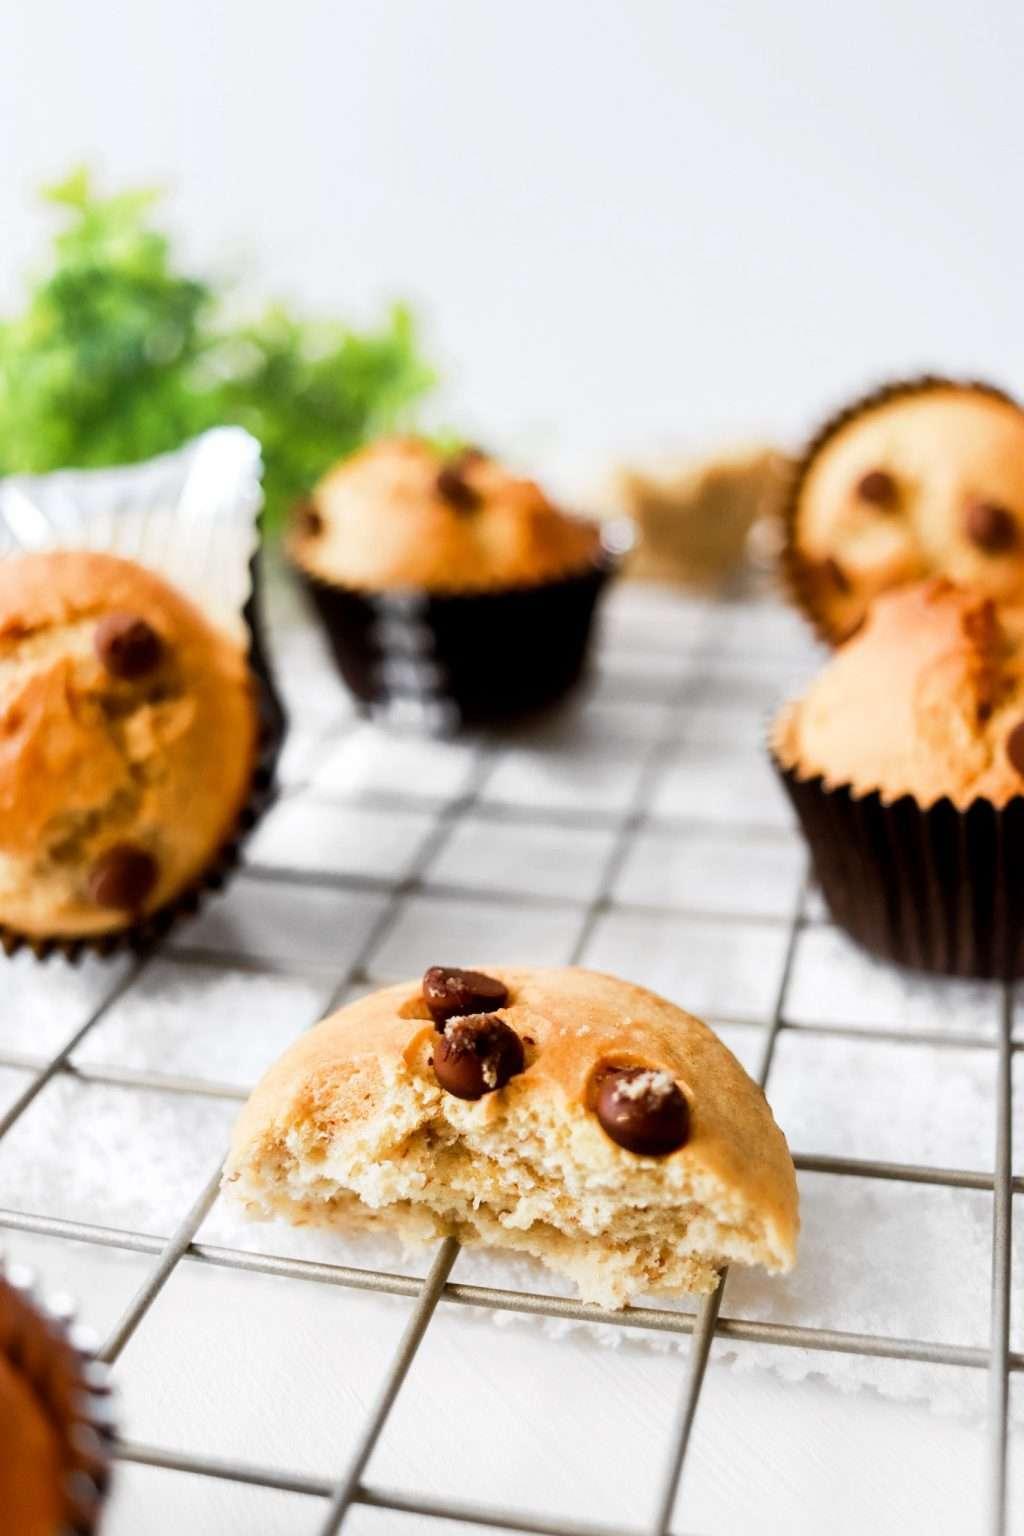 Banana muffins recipe 22 01 2021 03 40 39 1024x1536 - Banana Muffins Recipe For The Banana Lover | Quick & Easy